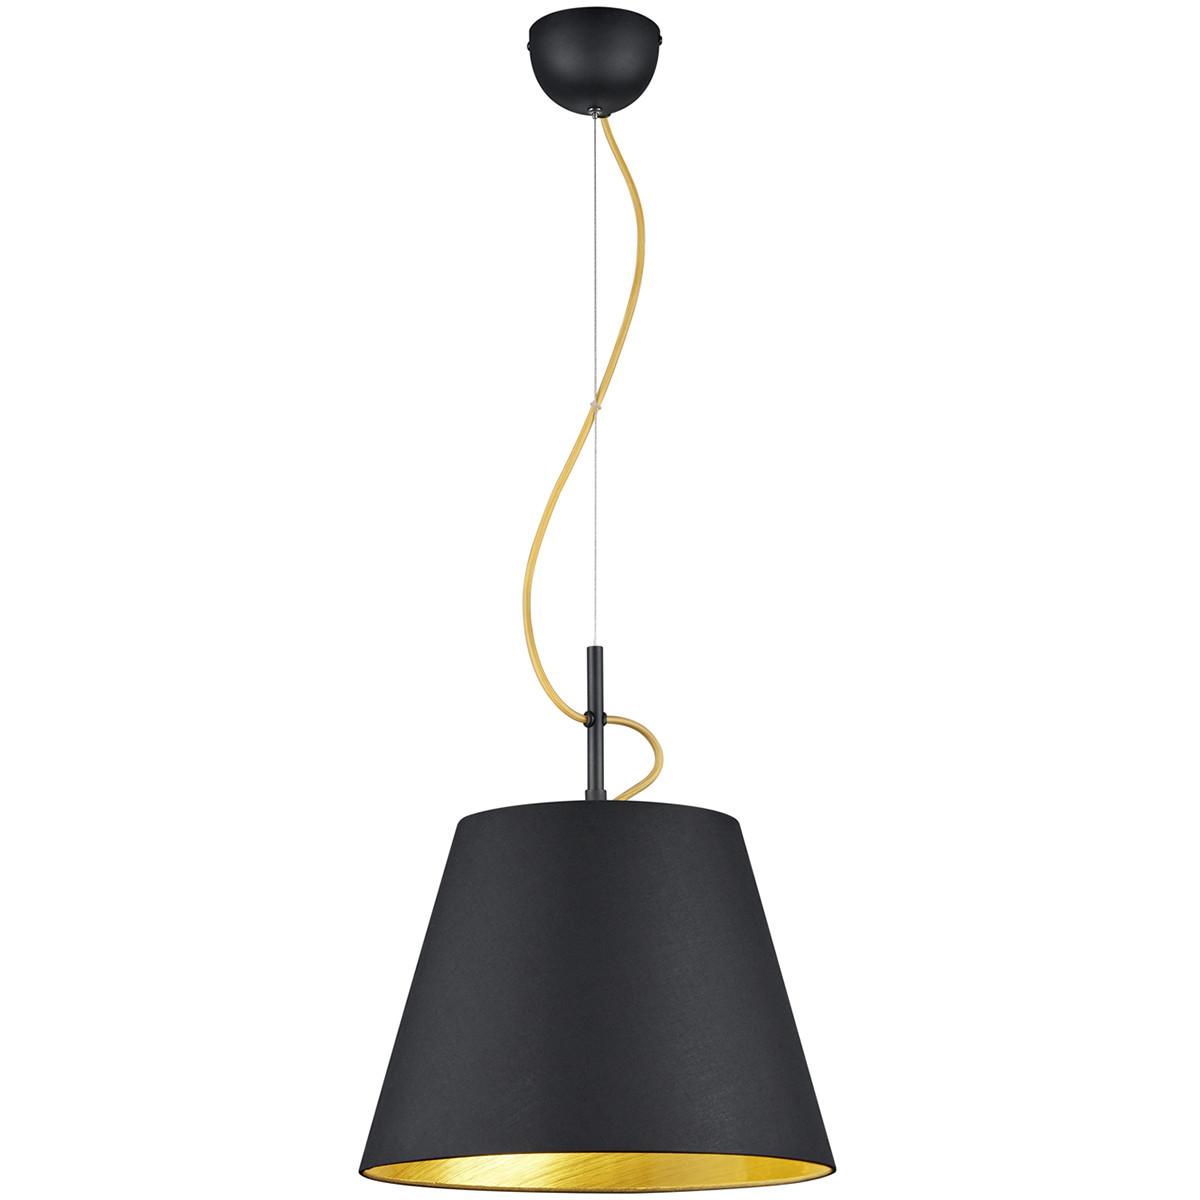 LED Hanglamp - Trion Andra - E27 Fitting - Rond - Mat Zwart - Aluminium